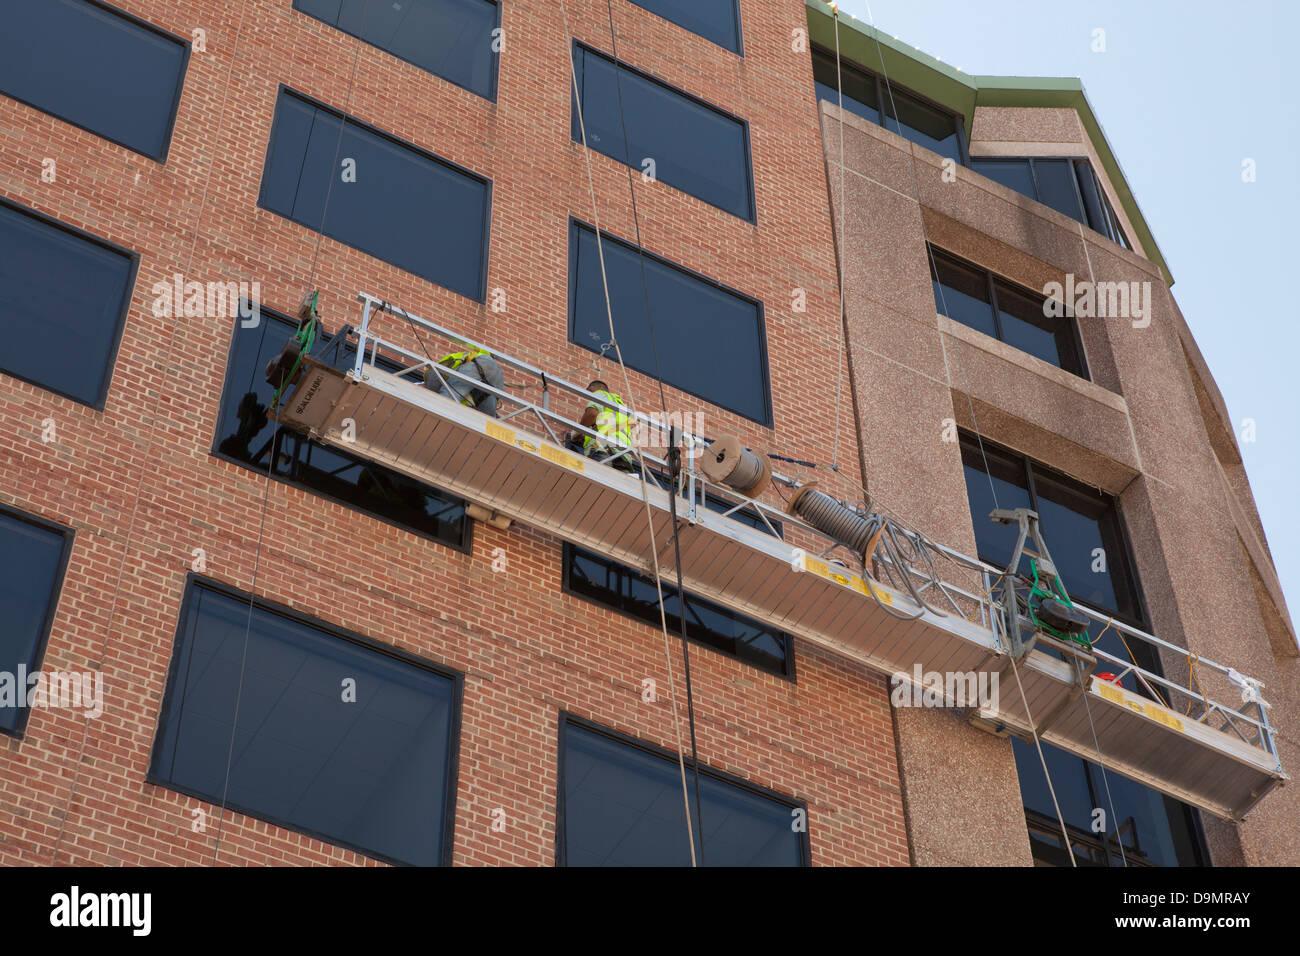 Men working on areal work platform - USA - Stock Image